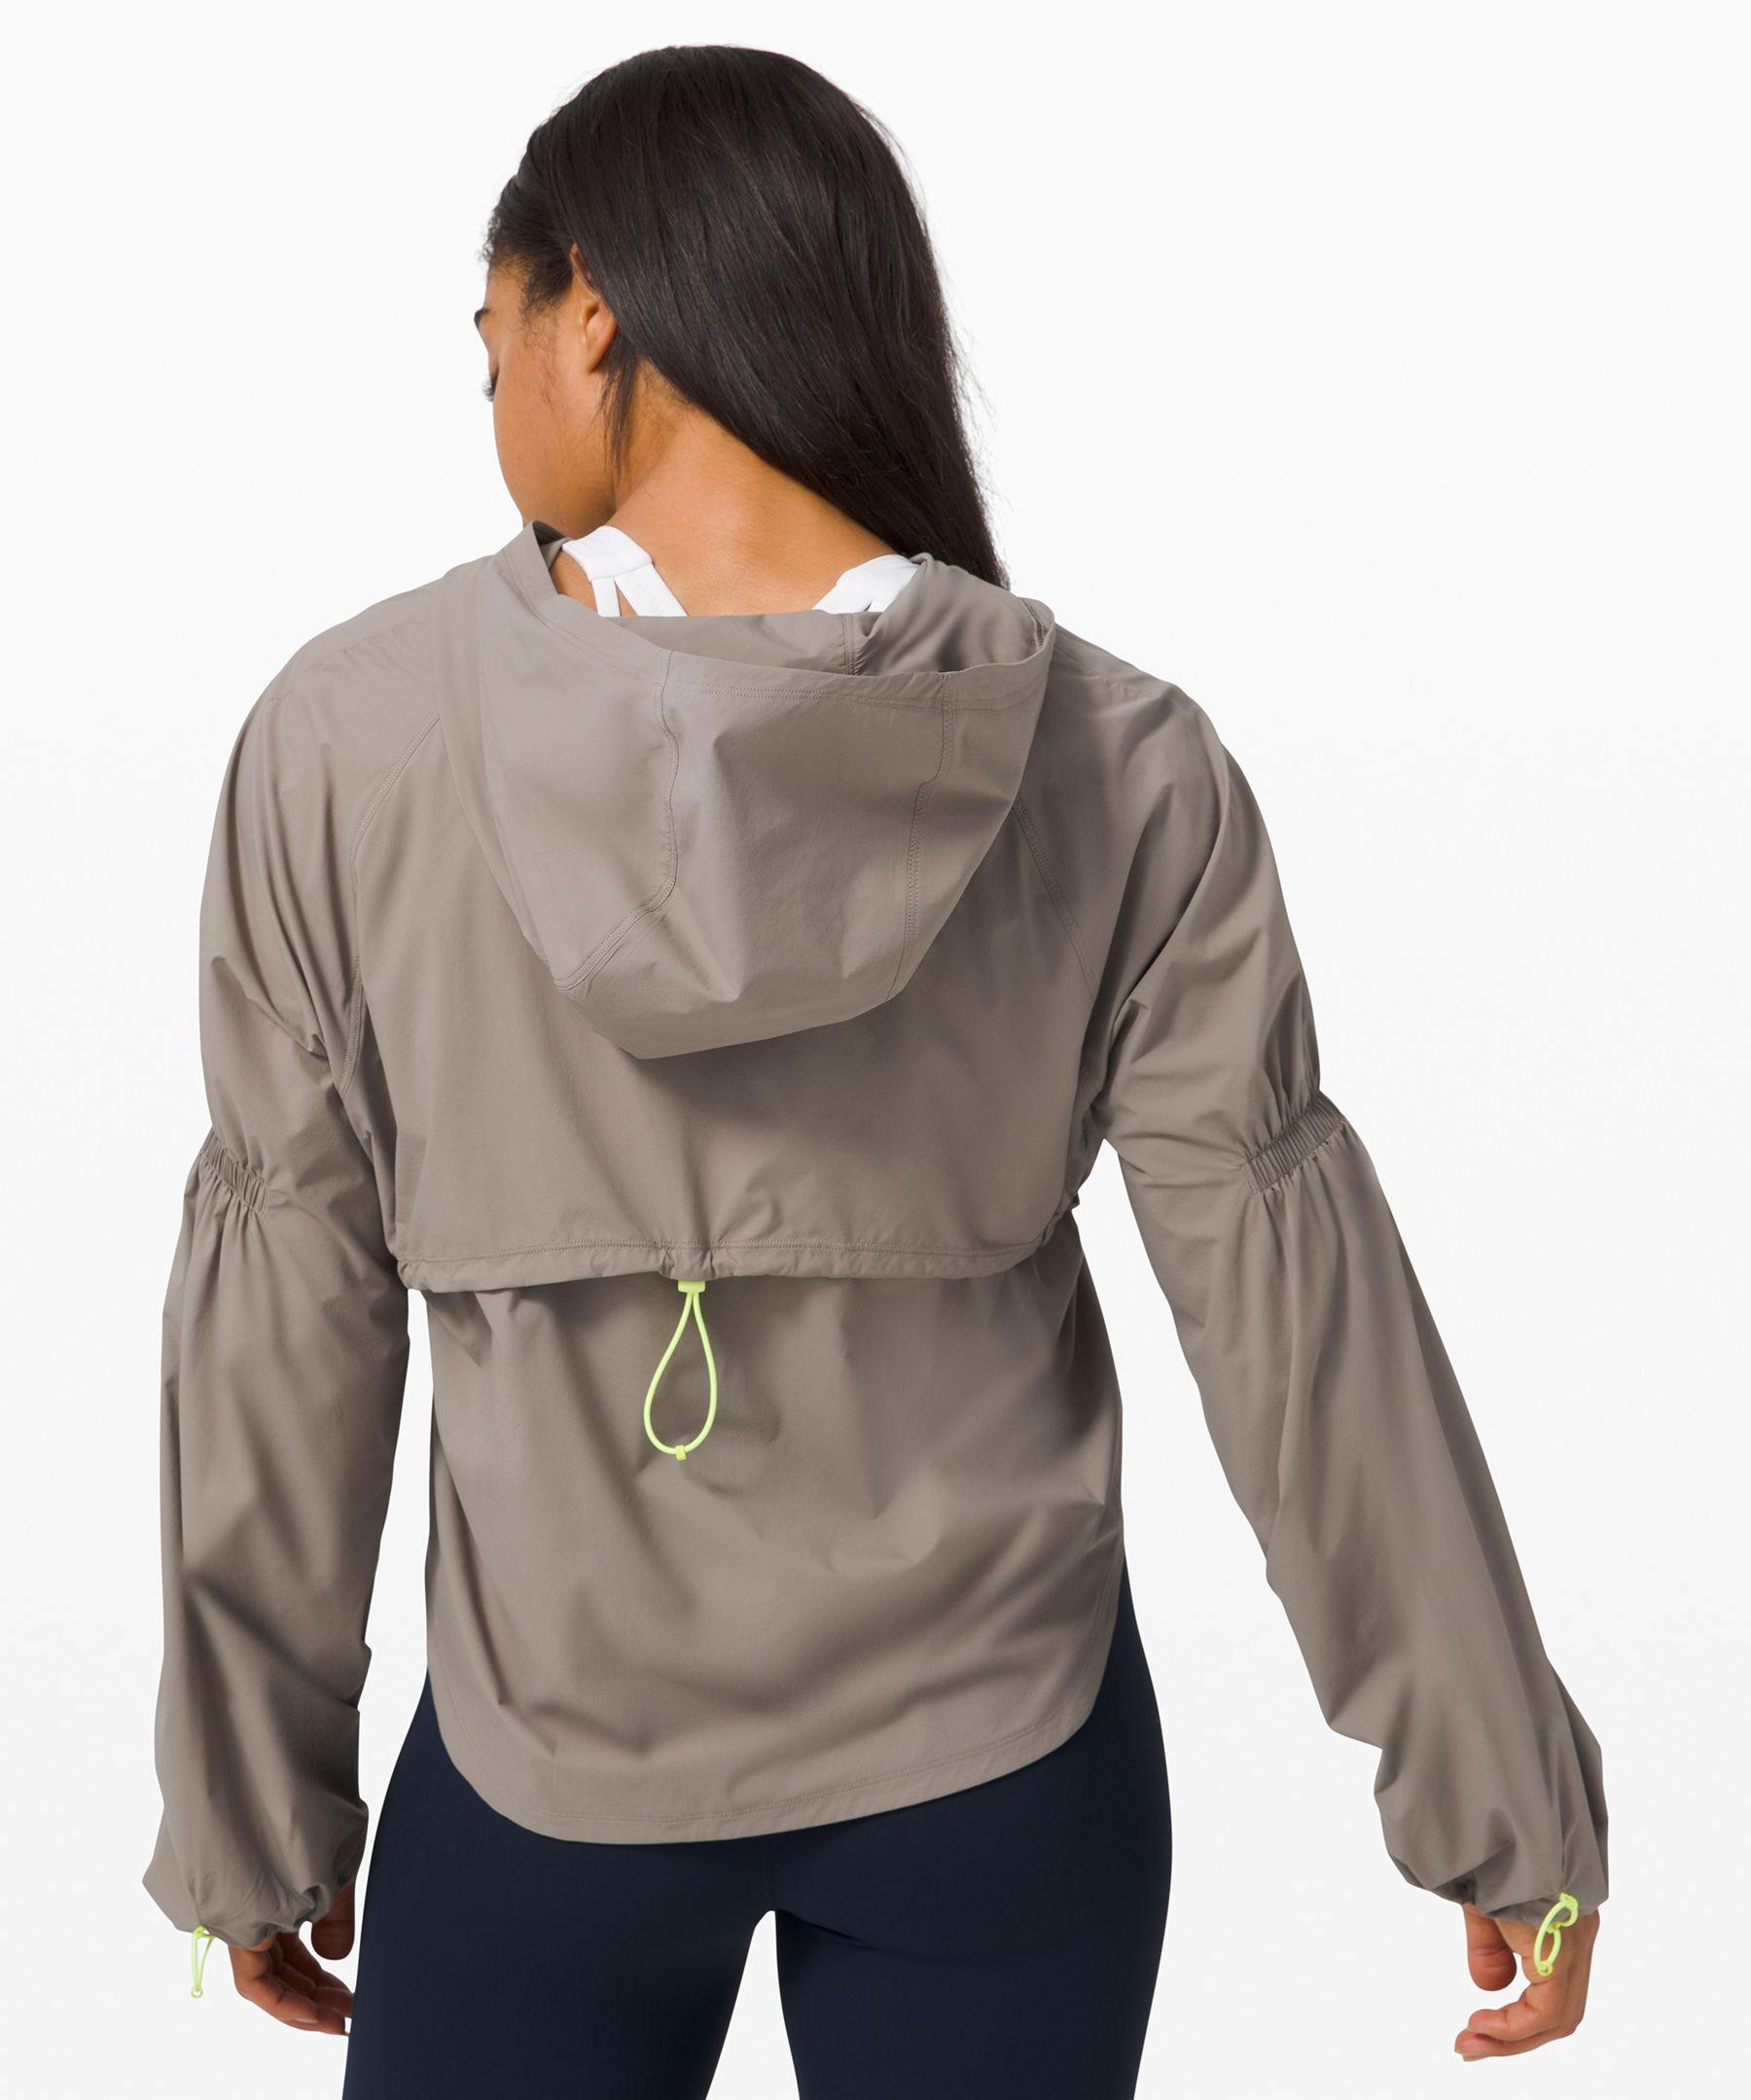 Better Weather Jacket